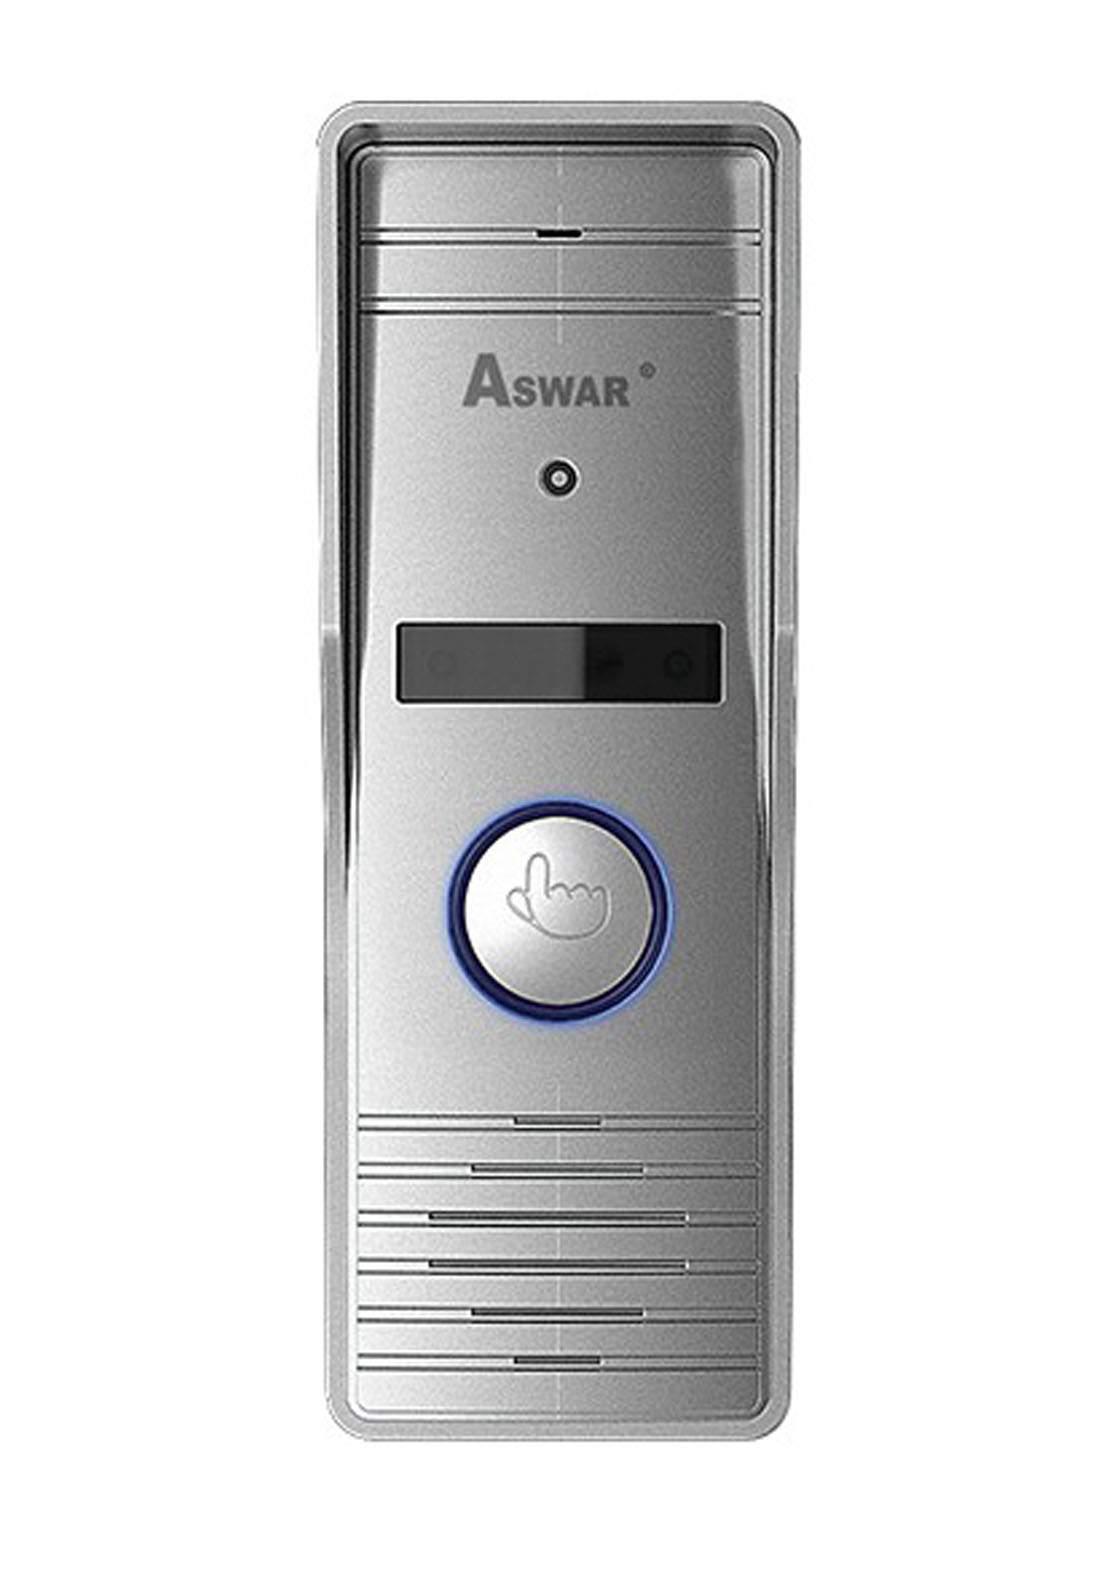 Aswar AS-VDP-IP Bell and Video Simulator To Open Doors حاكية فيديو